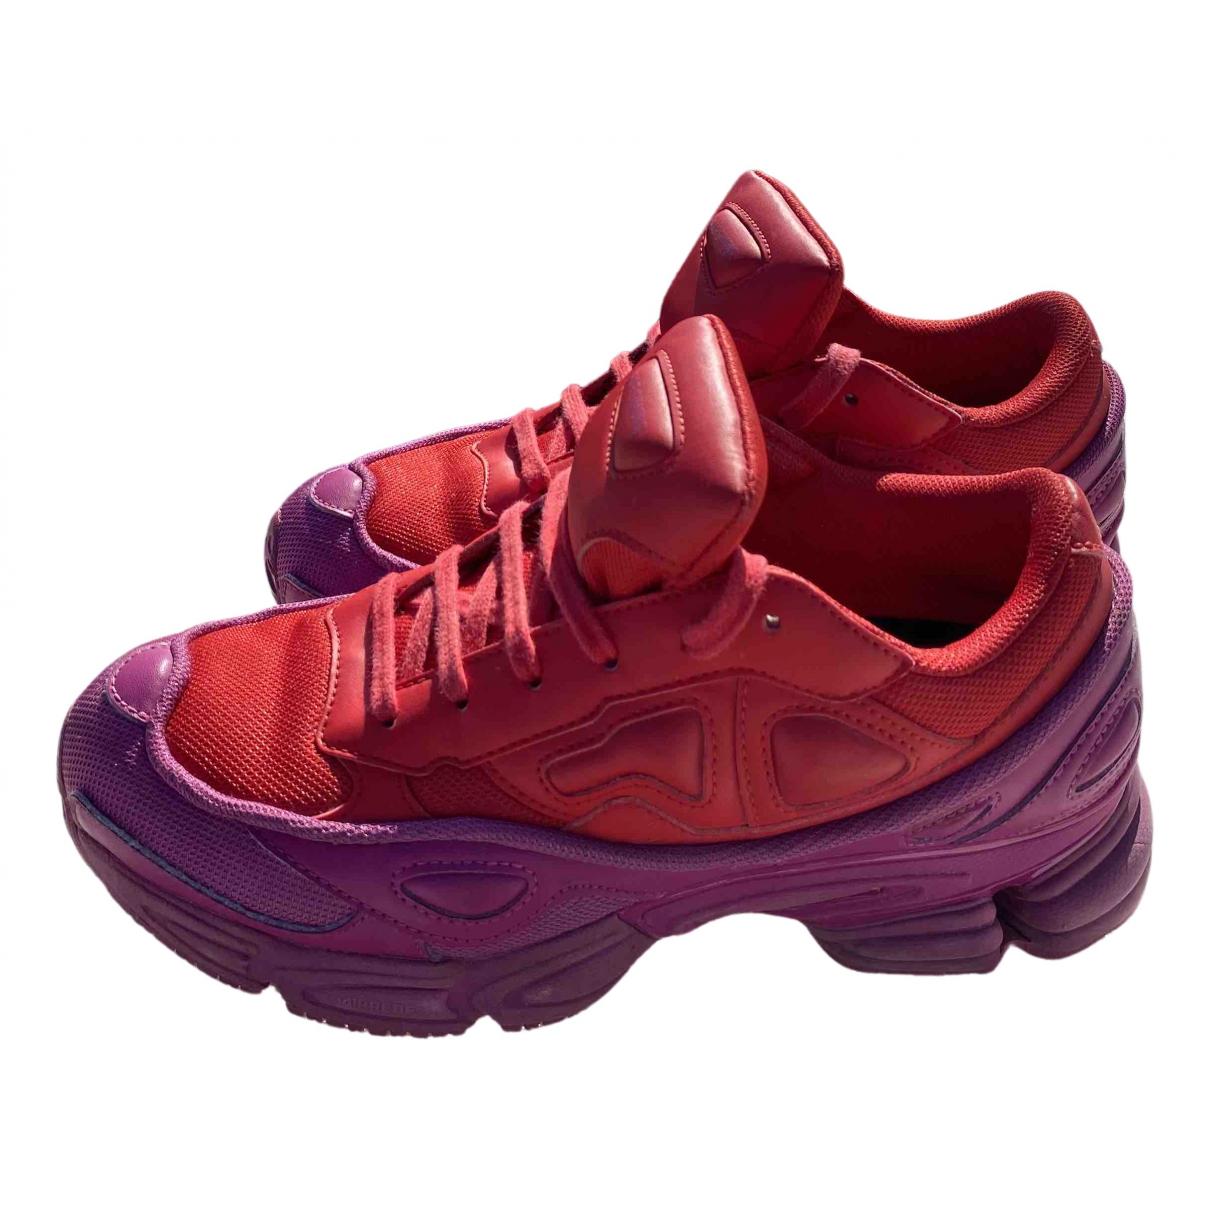 Adidas X Raf Simons Owzeego 3 Sneakers in  Bunt Leder